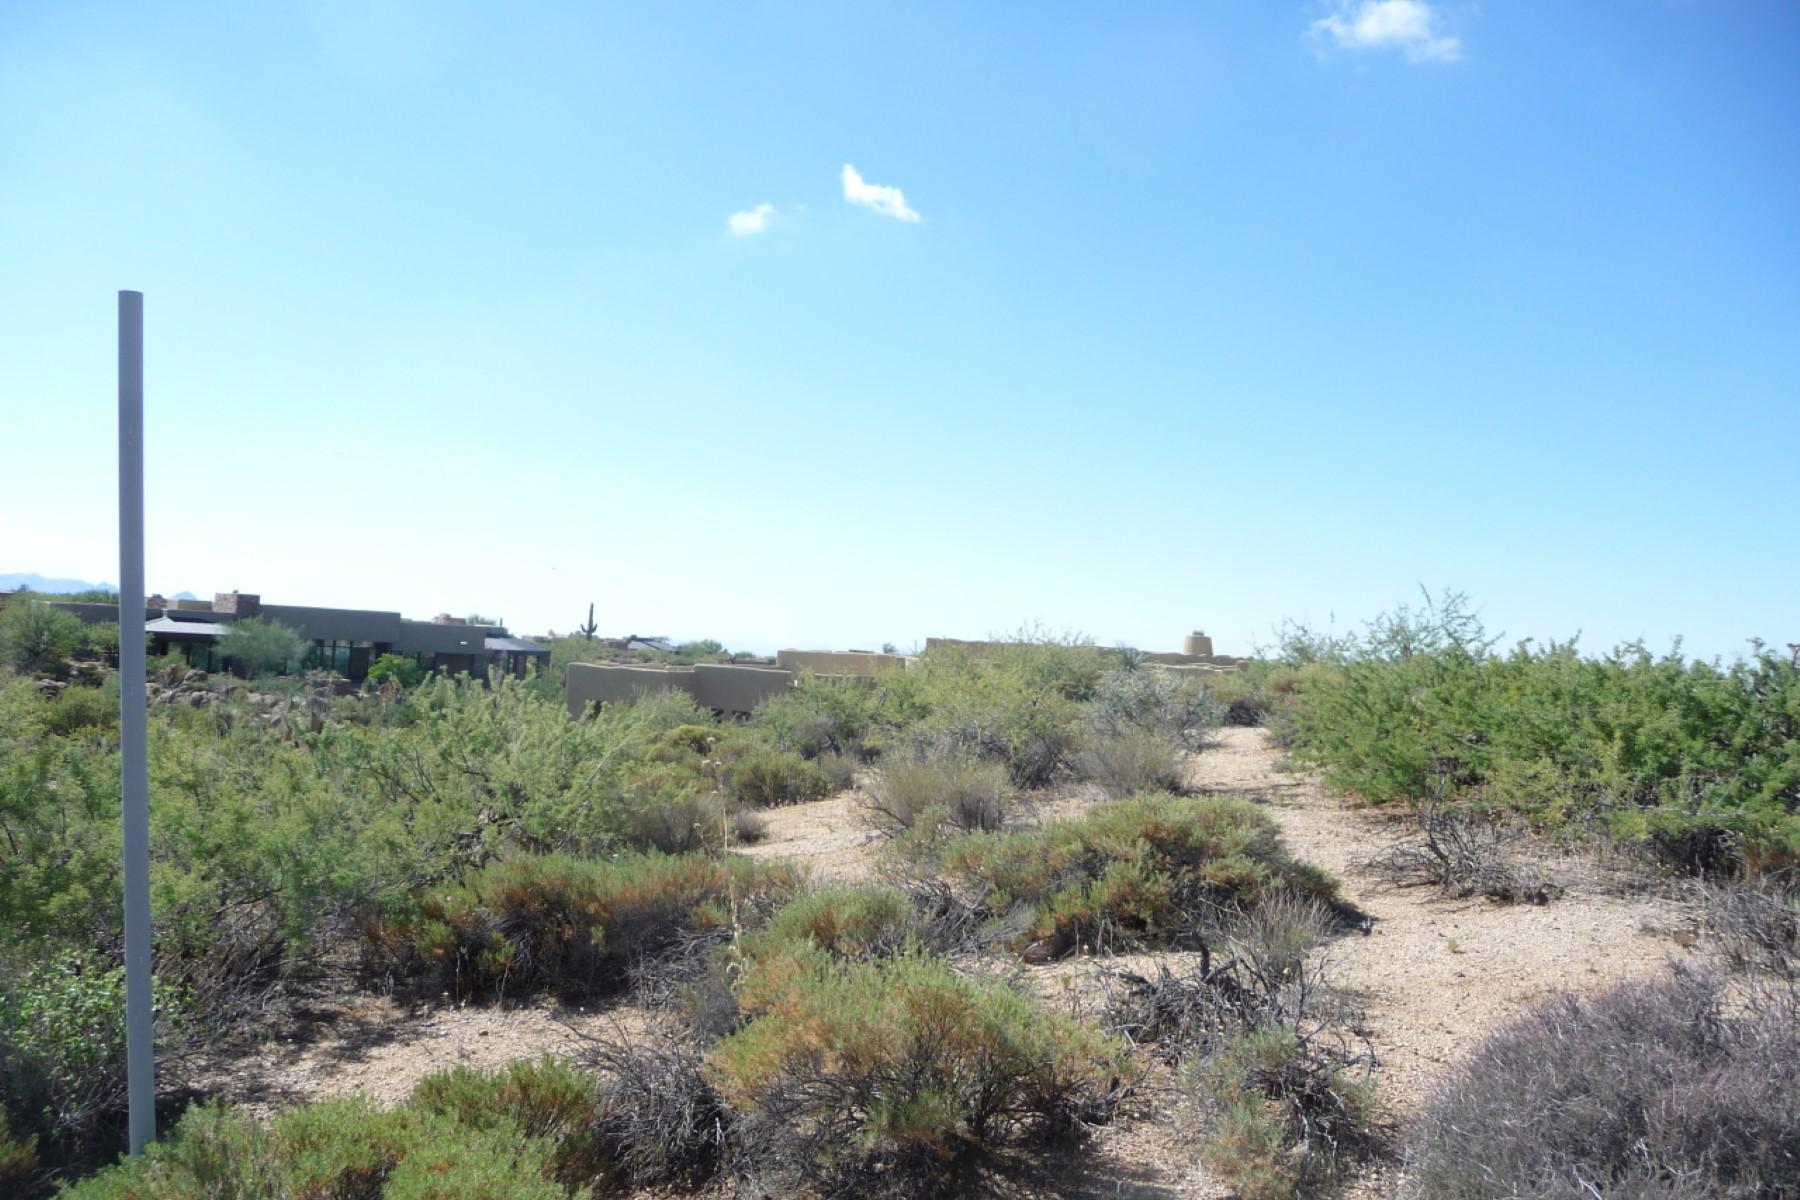 Terreno por un Venta en Prime cul-de-sac located within the Desert Mountain Community 10995 E Fortuna Dr #12 Scottsdale, Arizona, 85262 Estados Unidos